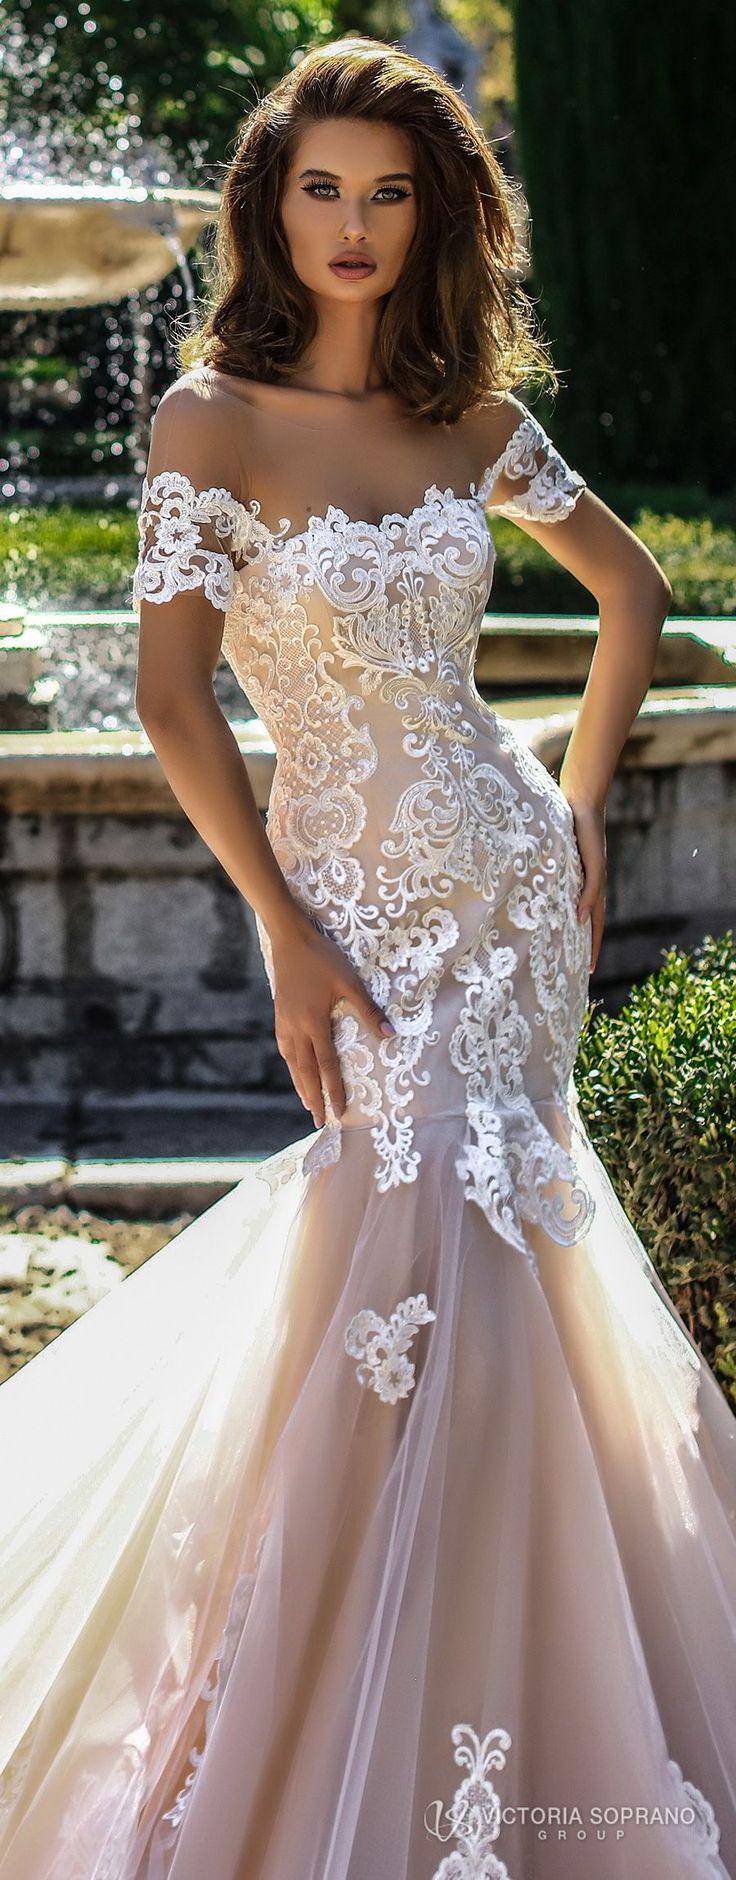 Wedding dresses springfield mo   best WEDDING IDEAS images on Pinterest  Backdrops Decorations